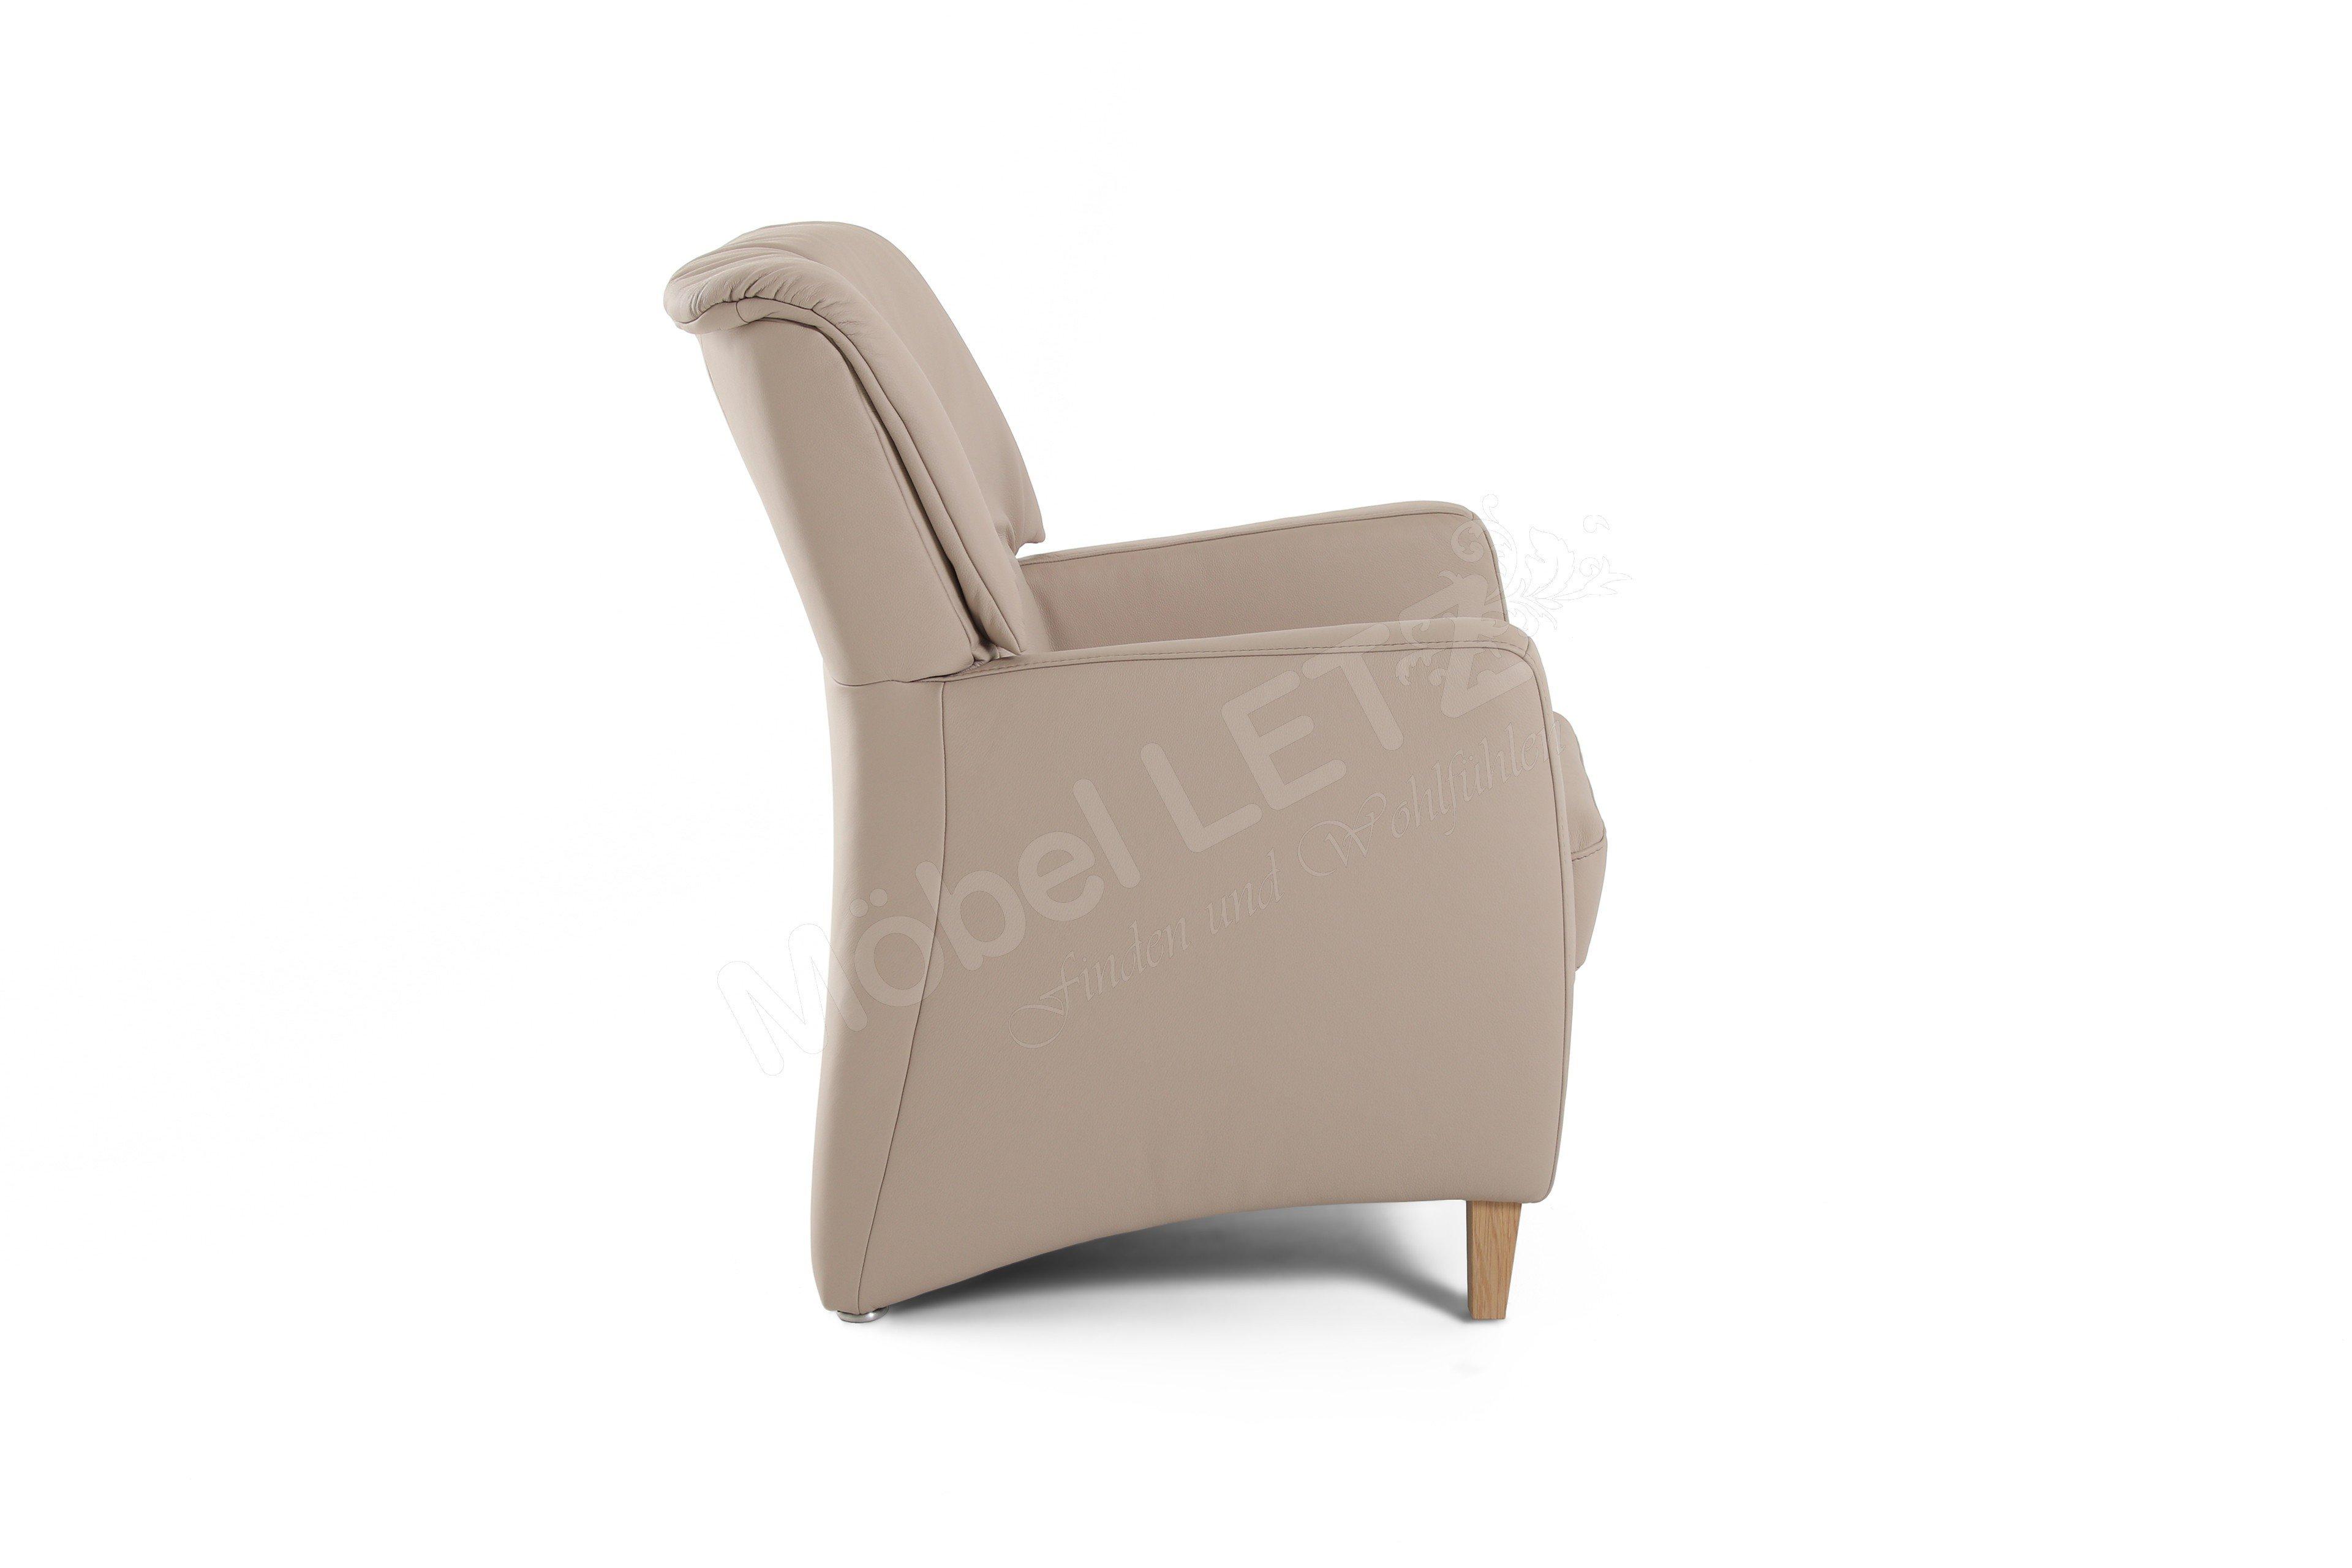 pm oelsa viola einzelsessel in beige m bel letz ihr. Black Bedroom Furniture Sets. Home Design Ideas